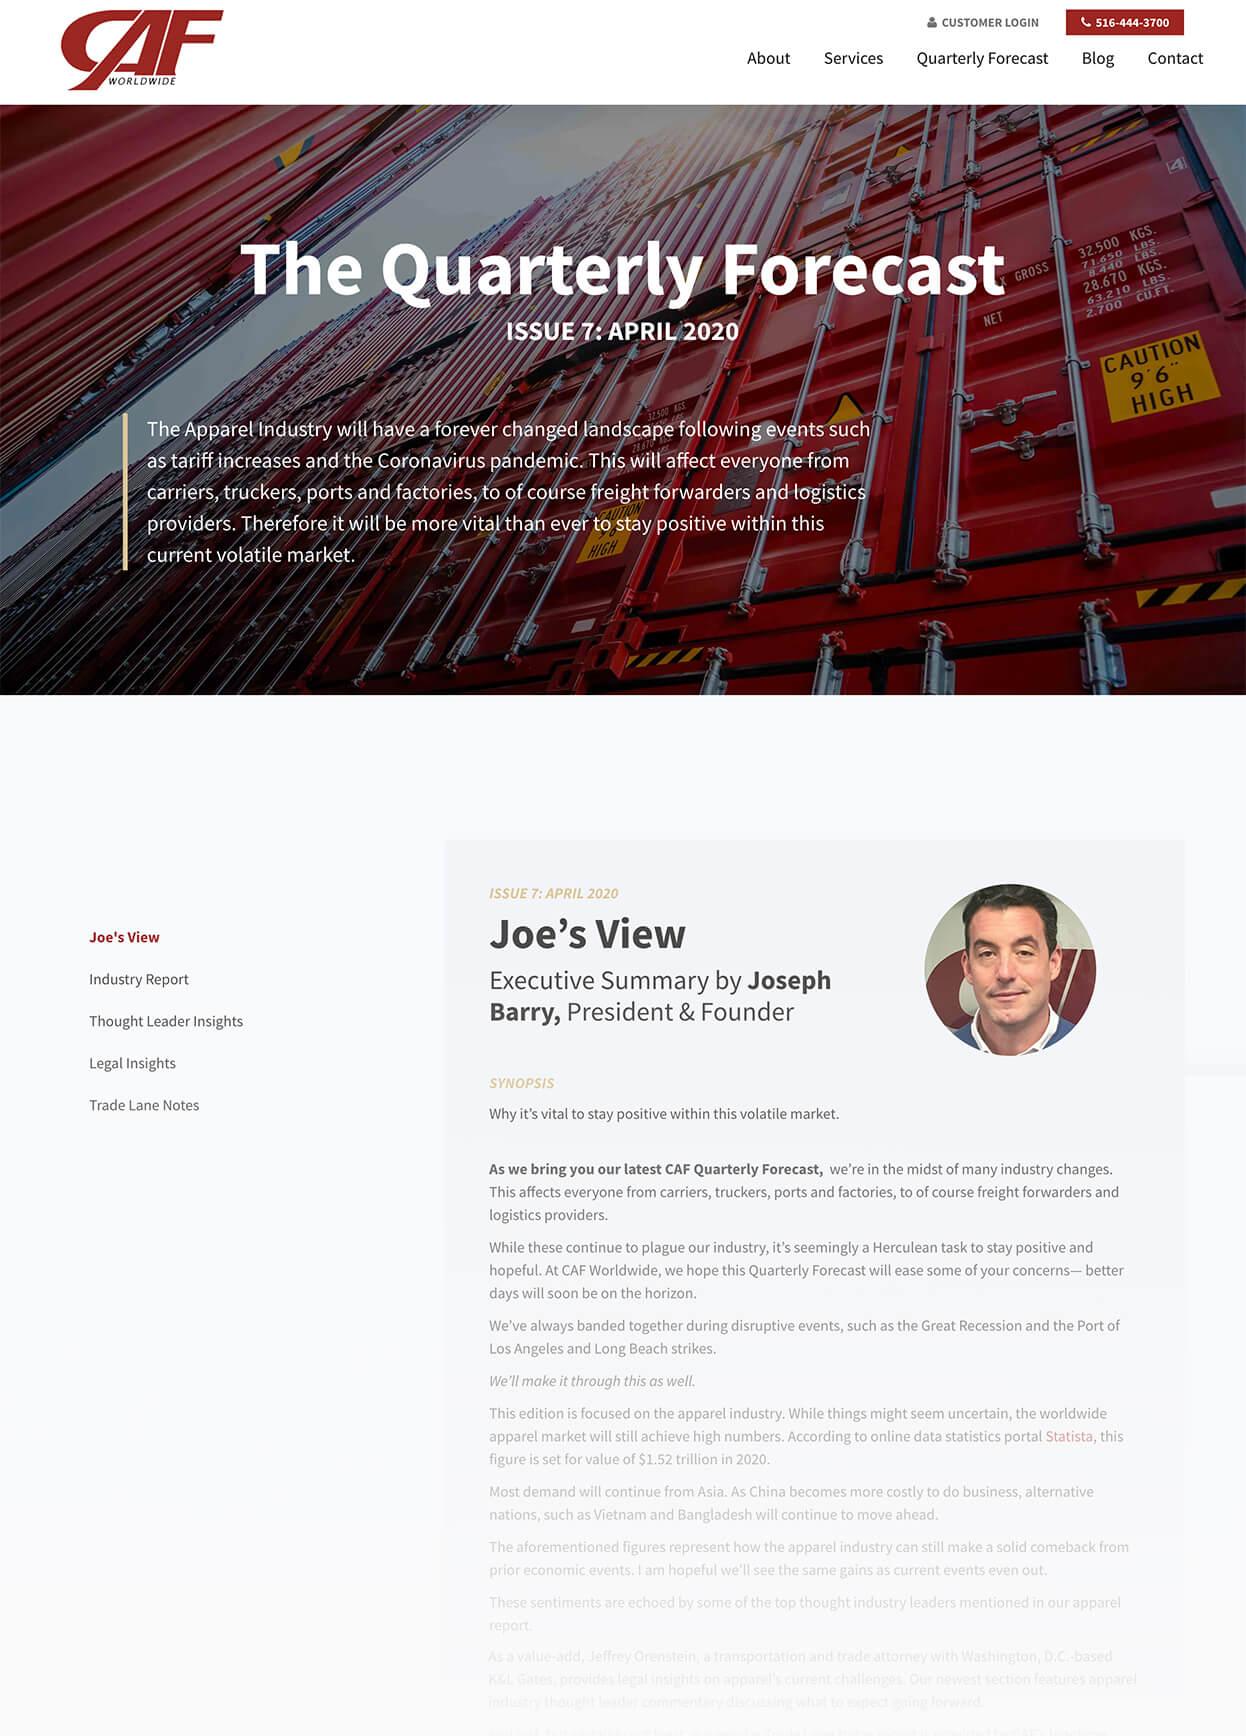 Screenshot of CAF Quarterly Forecast Issue 7 Pillar Page